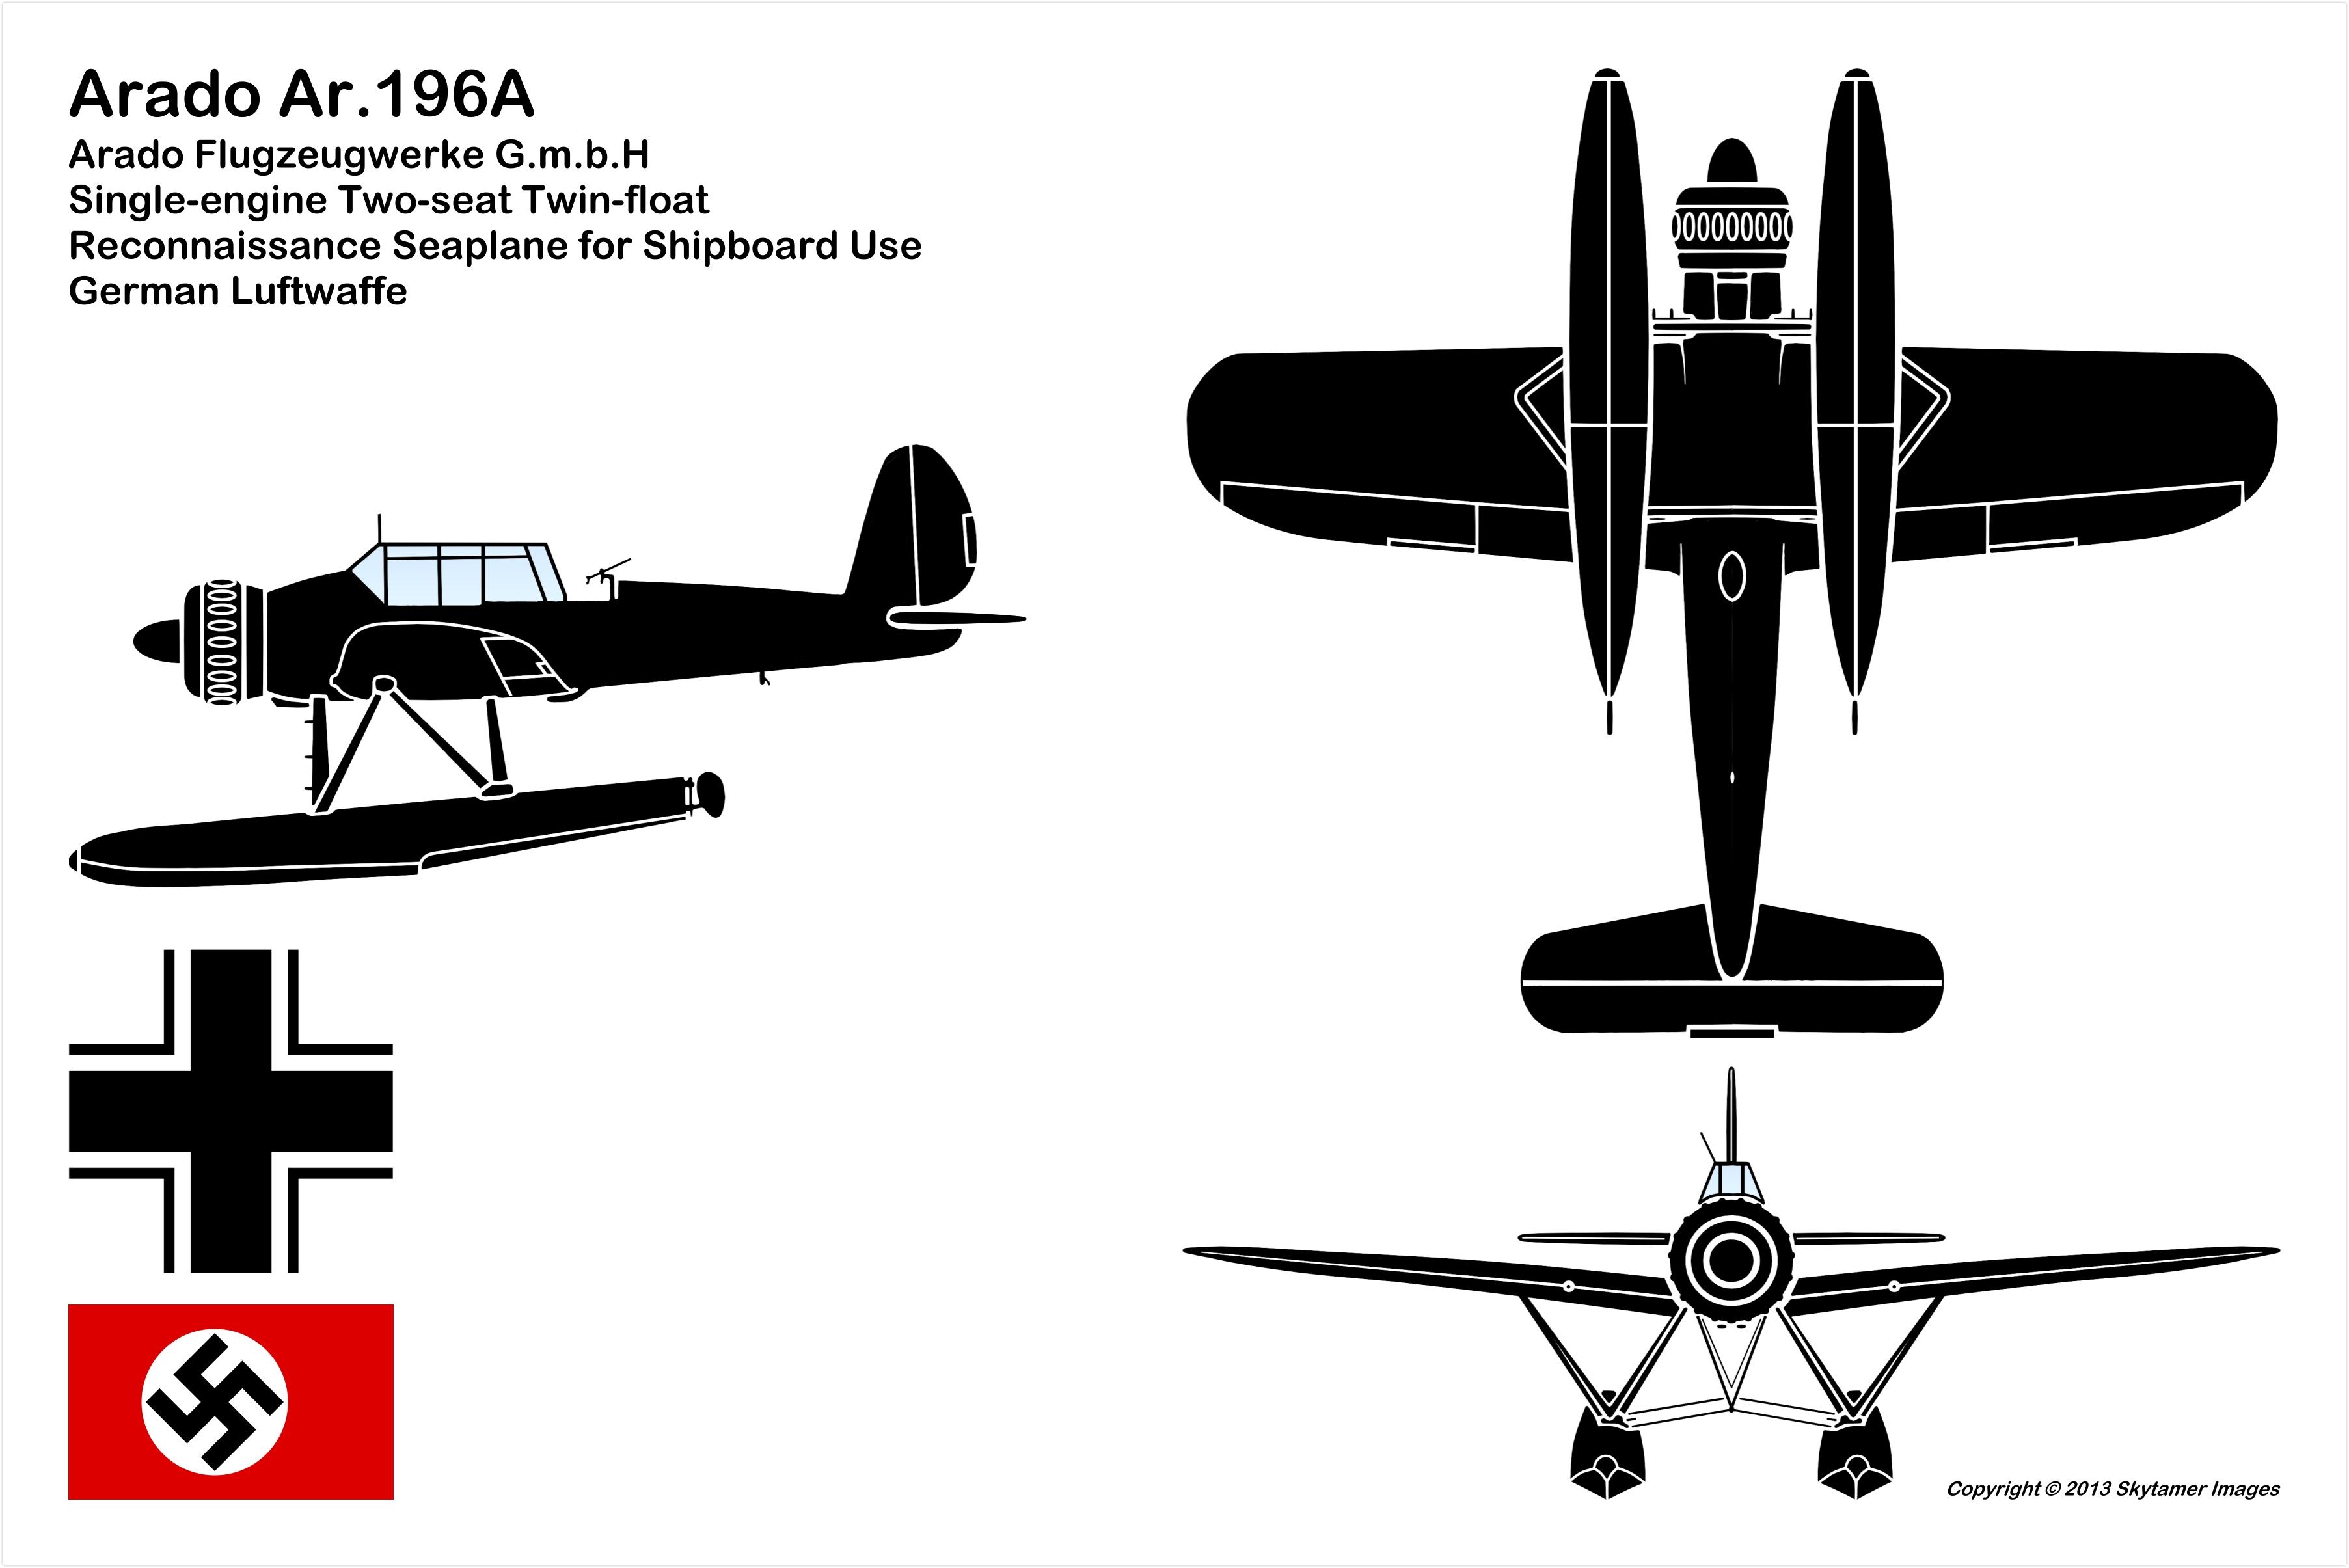 Arado Ar 196a Wwii German Reconnaissance Aircraft